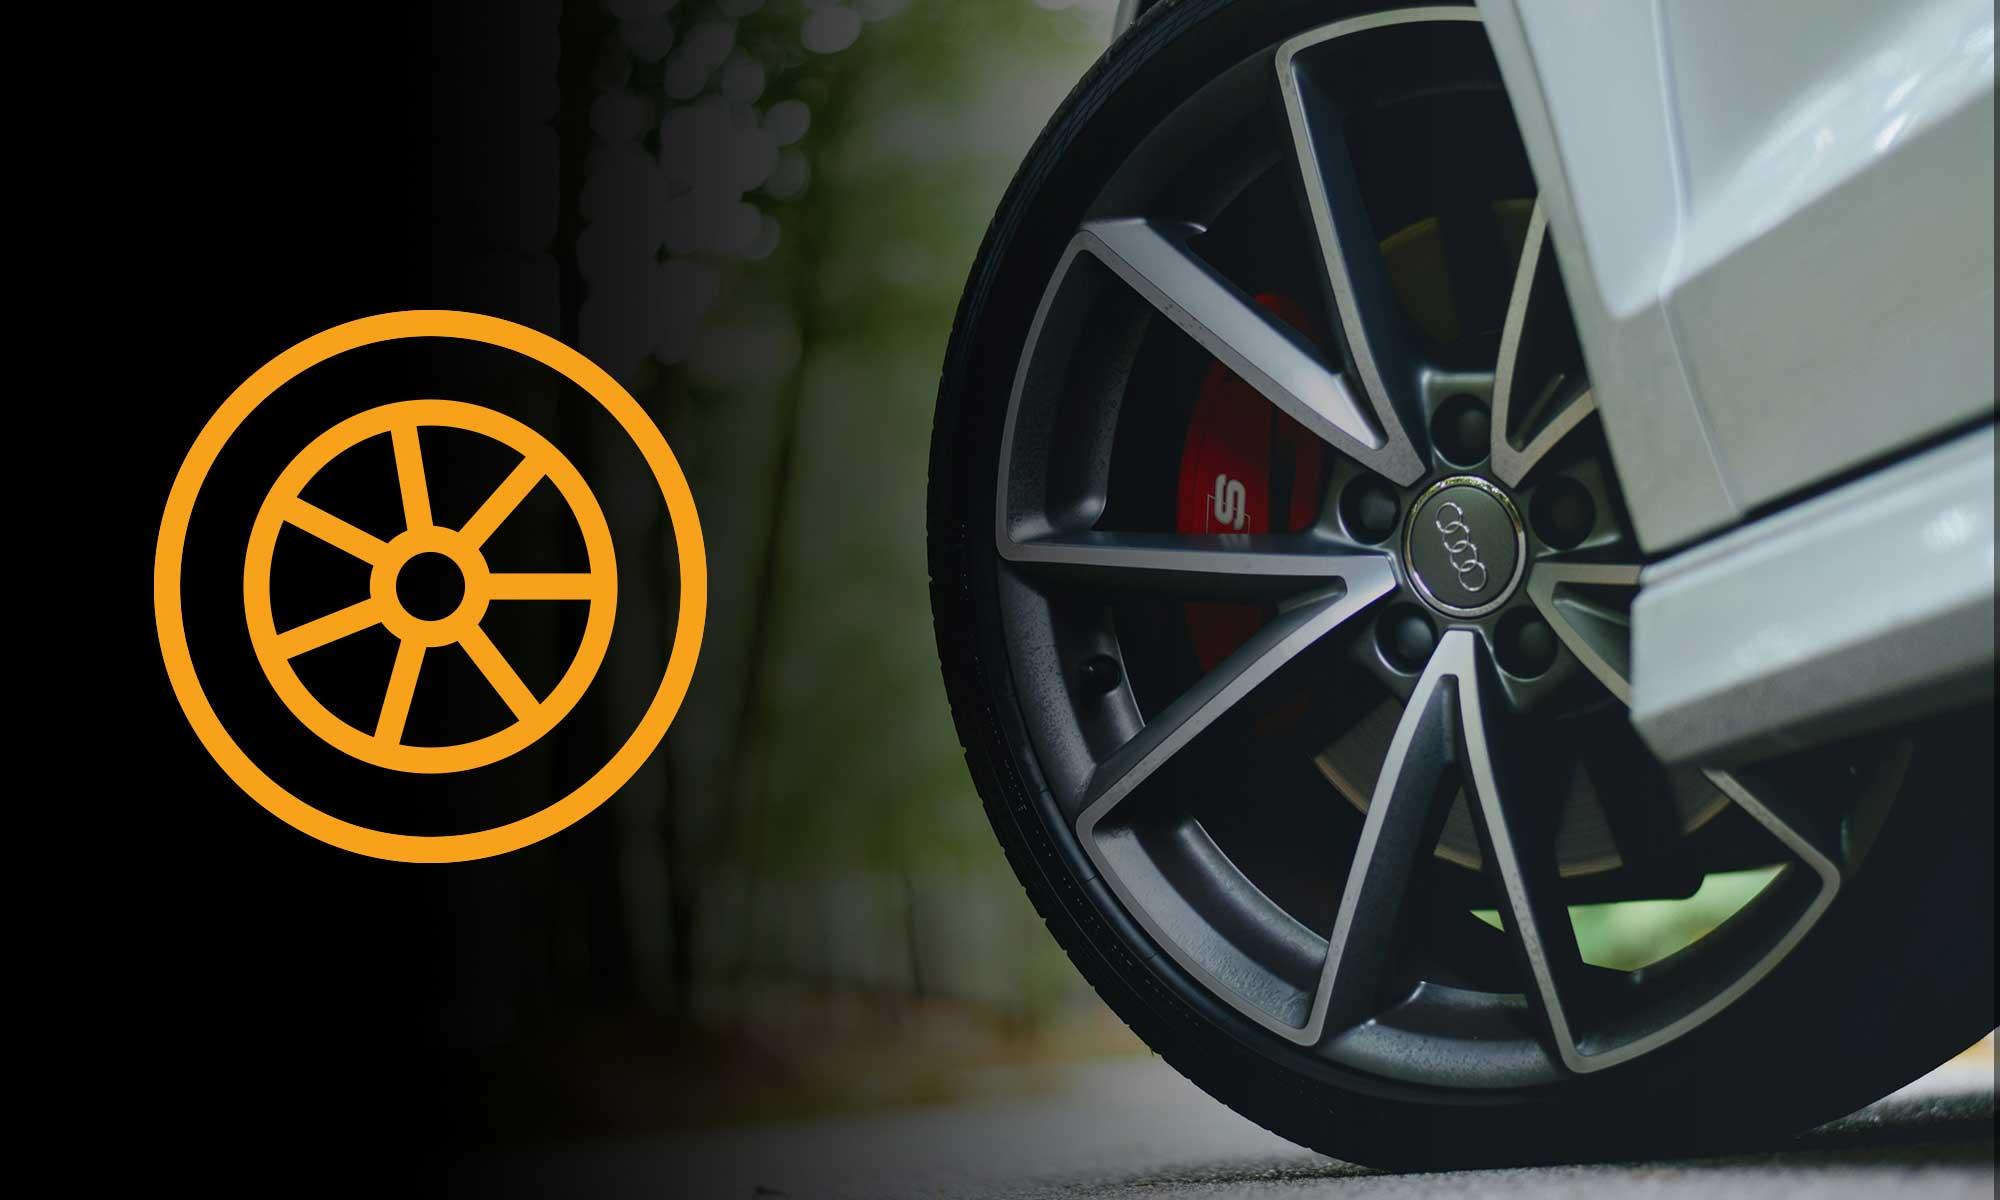 Endurance-Elite-Tire-Replacement-Reimbursement